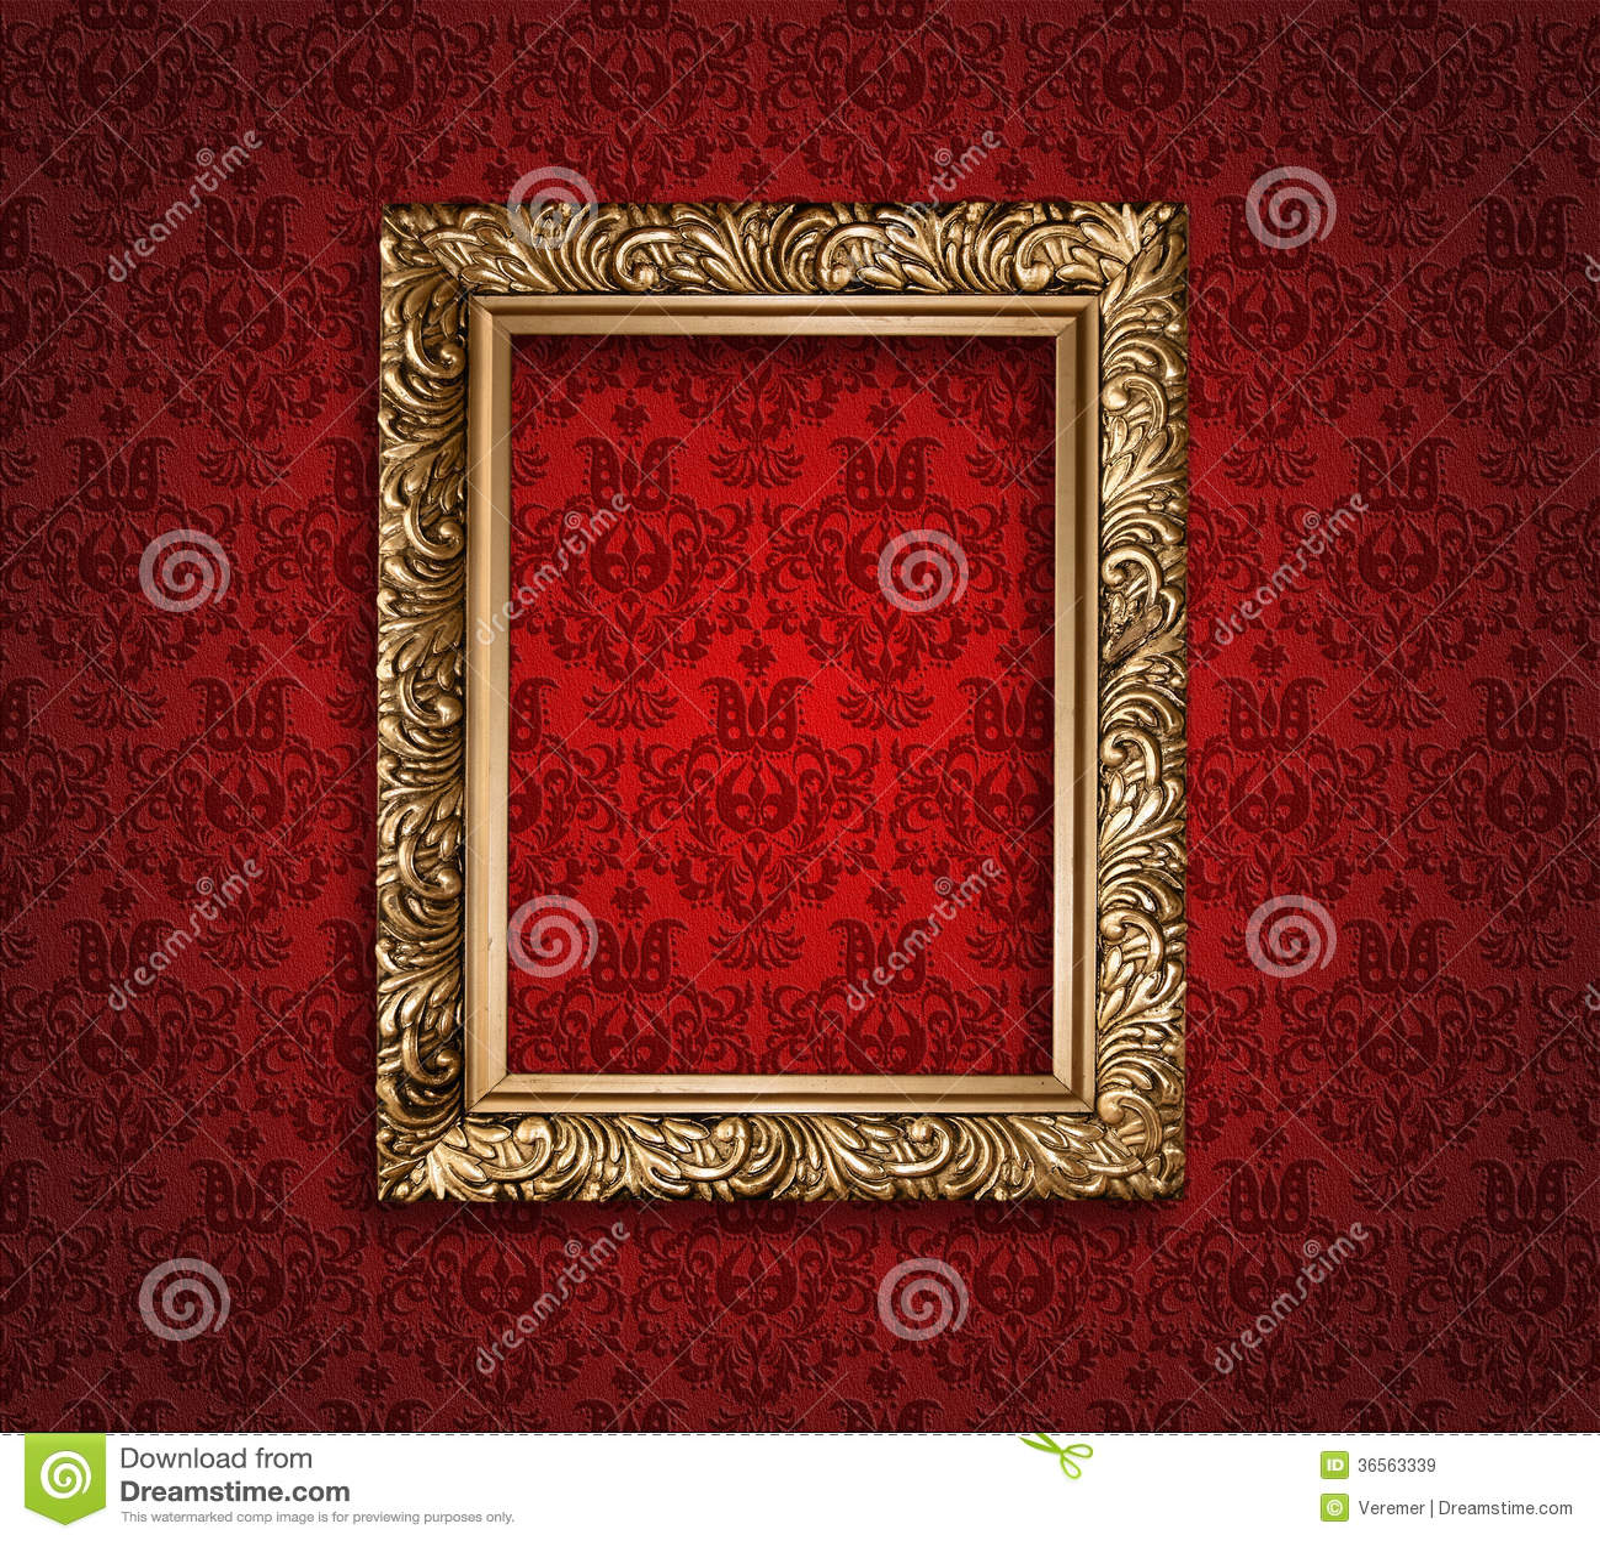 Antiker Goldener Rahmen Auf Roter Tapete. Stockbild - Bild von ...